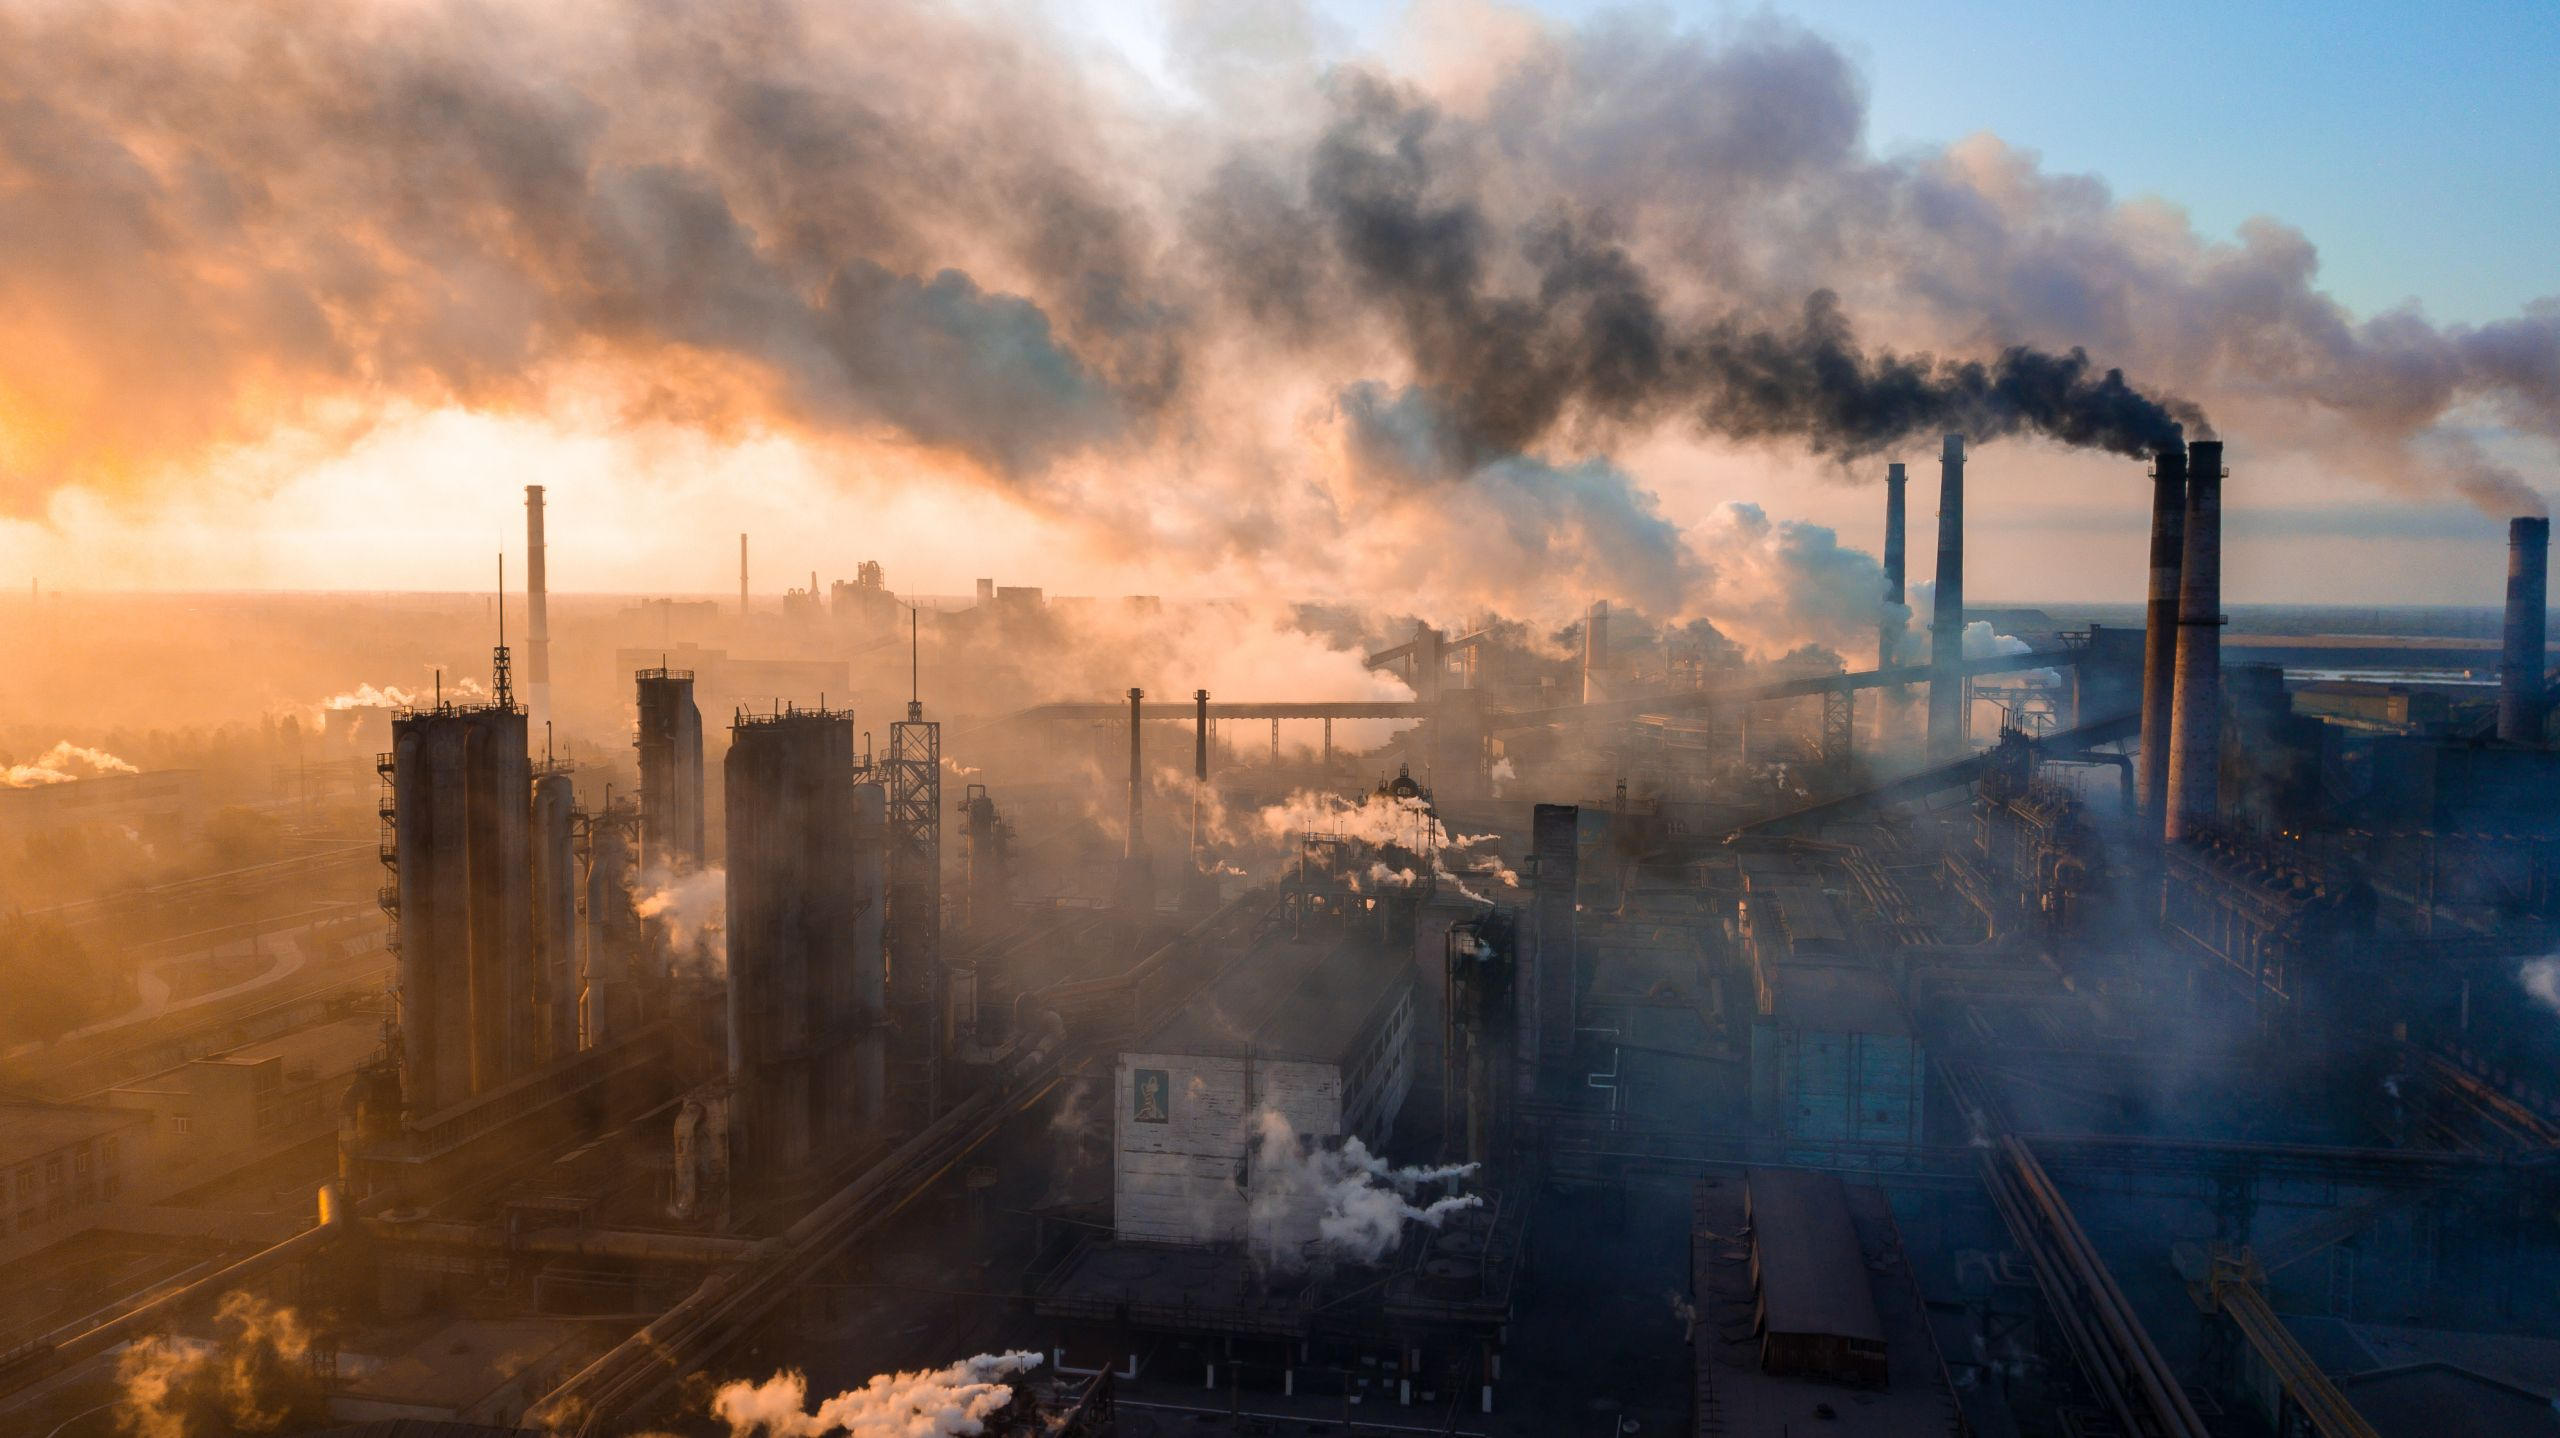 Industrial area polluting